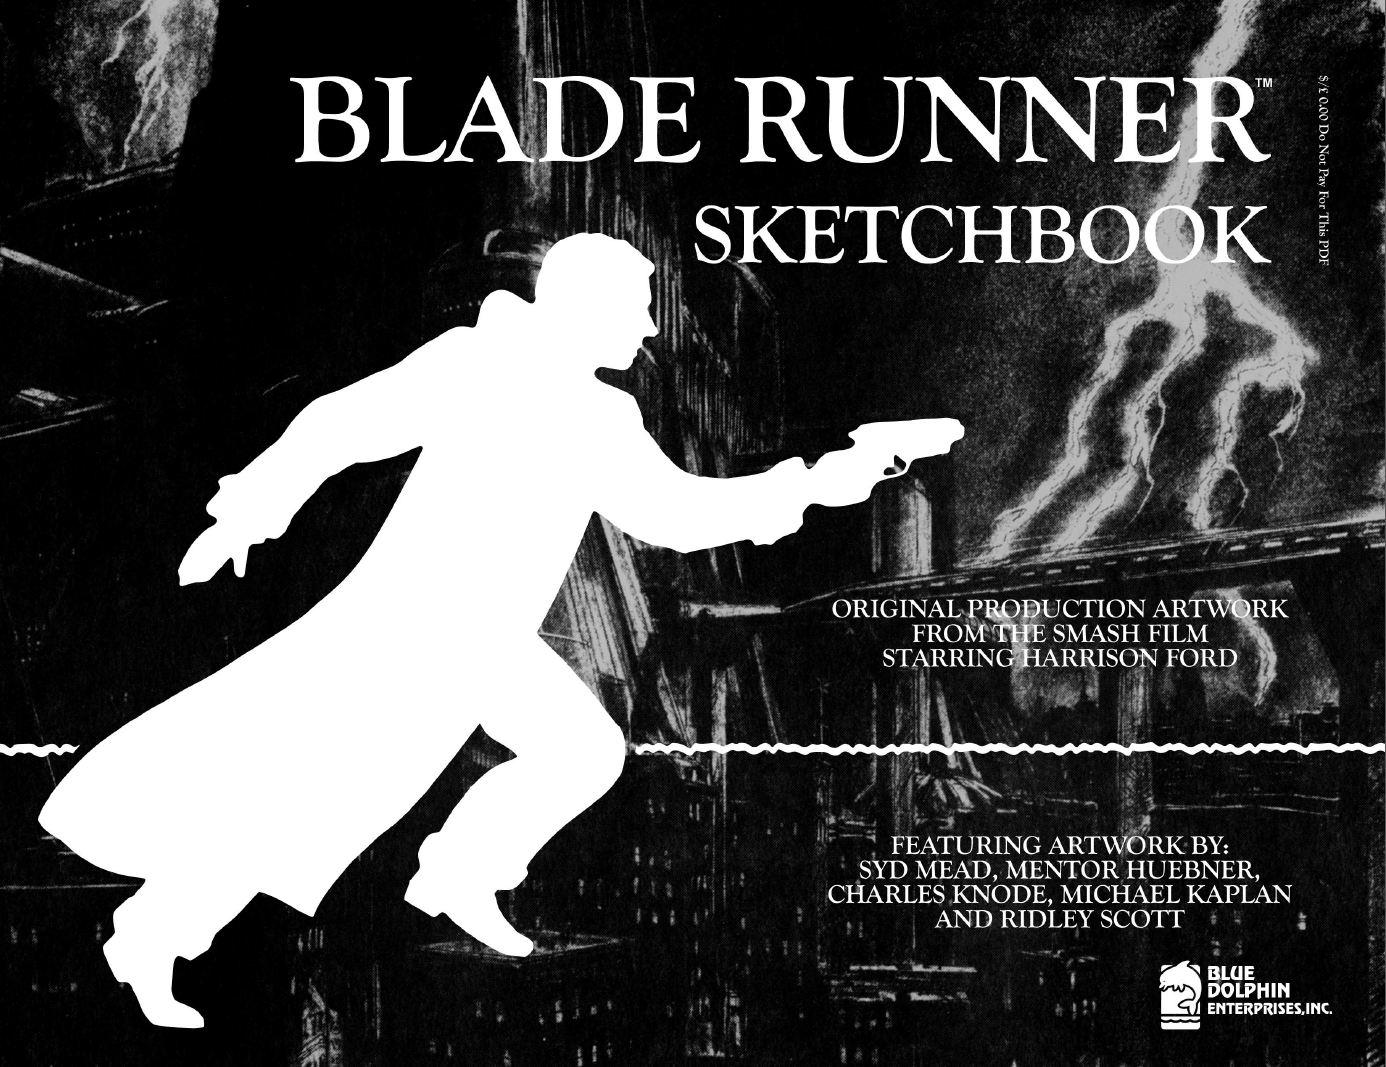 Runner sketchbook pdf blade